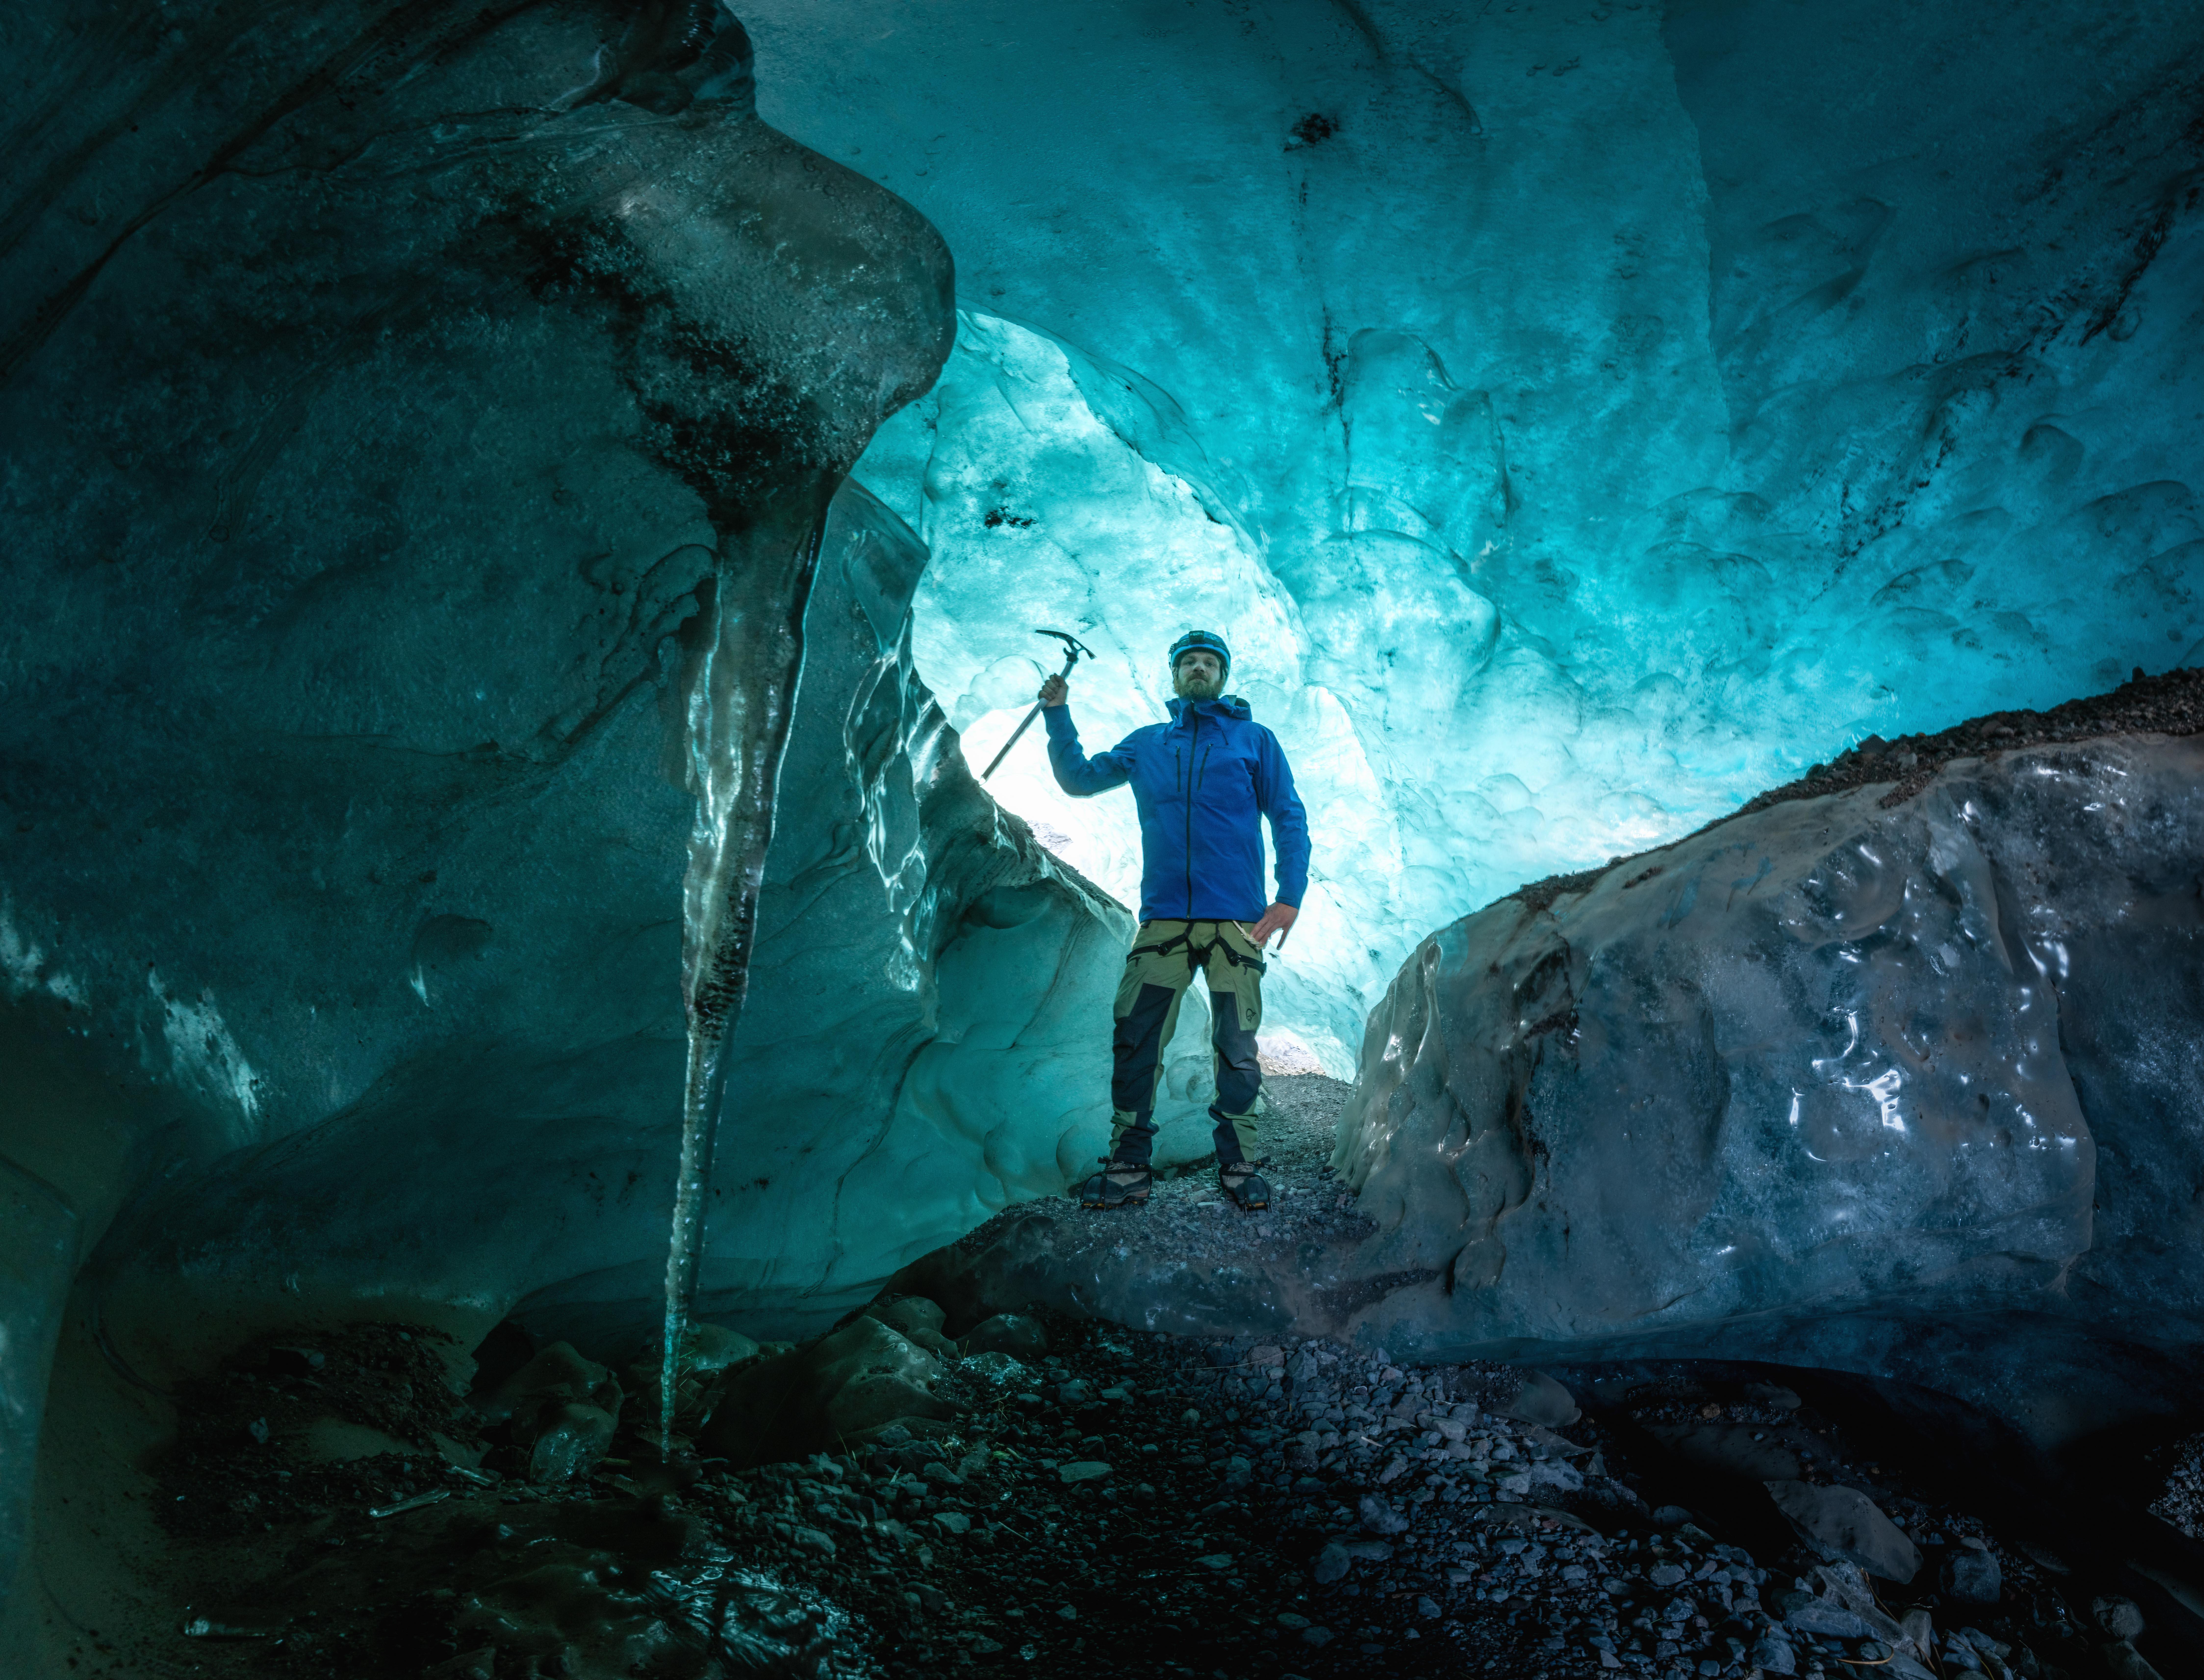 2 Day Northern Lights & Ice Cave Tour with Glacier Hiking & Jokulsarlon Glacier Lagoon